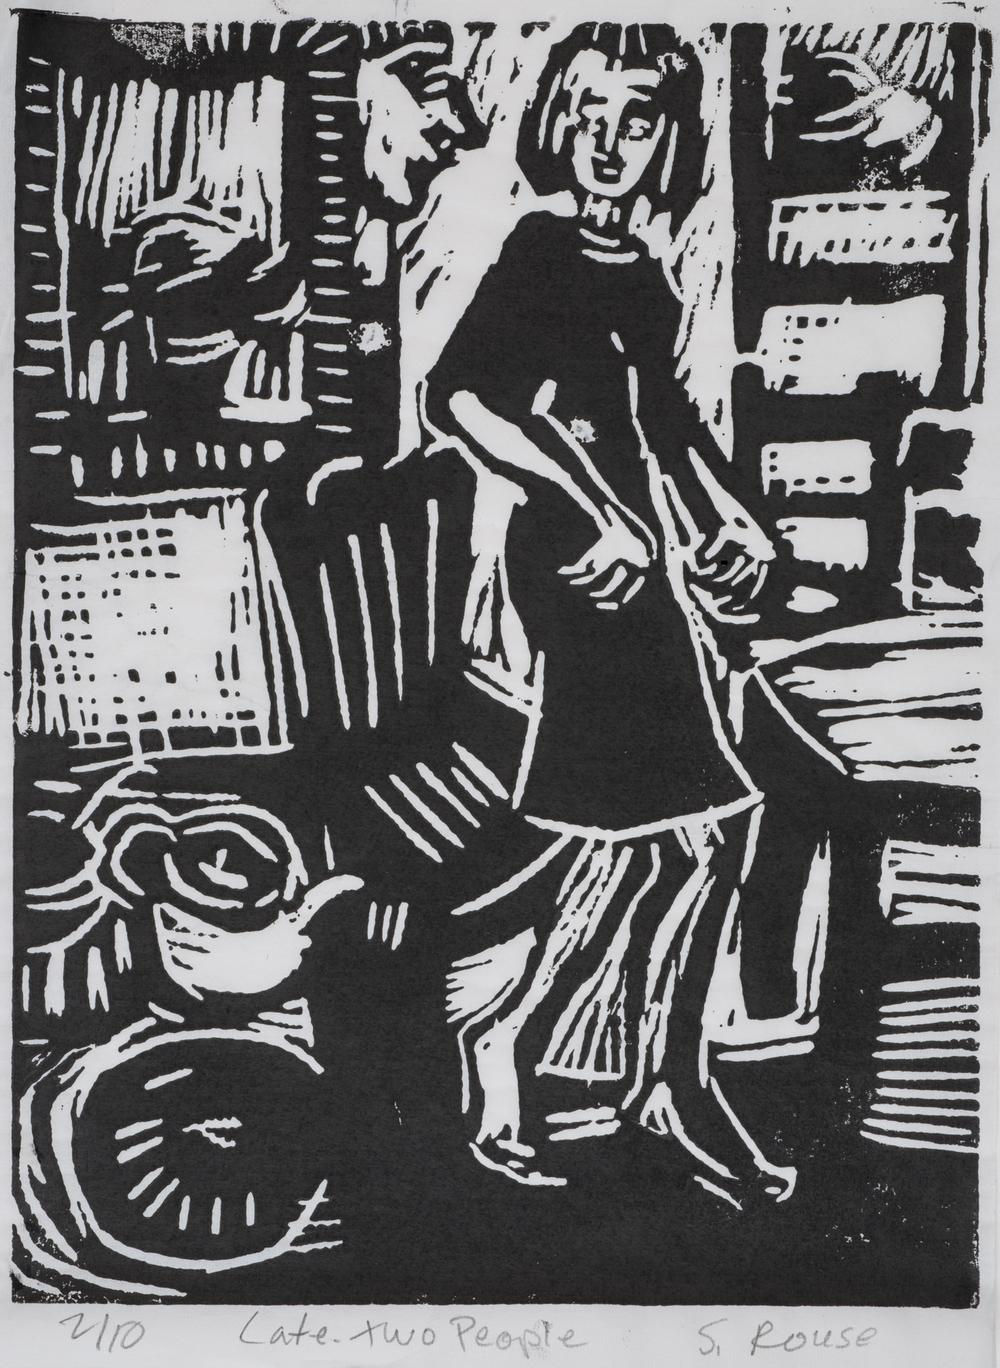 """Two People Late Kitchen"", Linoleum Cut, 13""x9"", 2015"